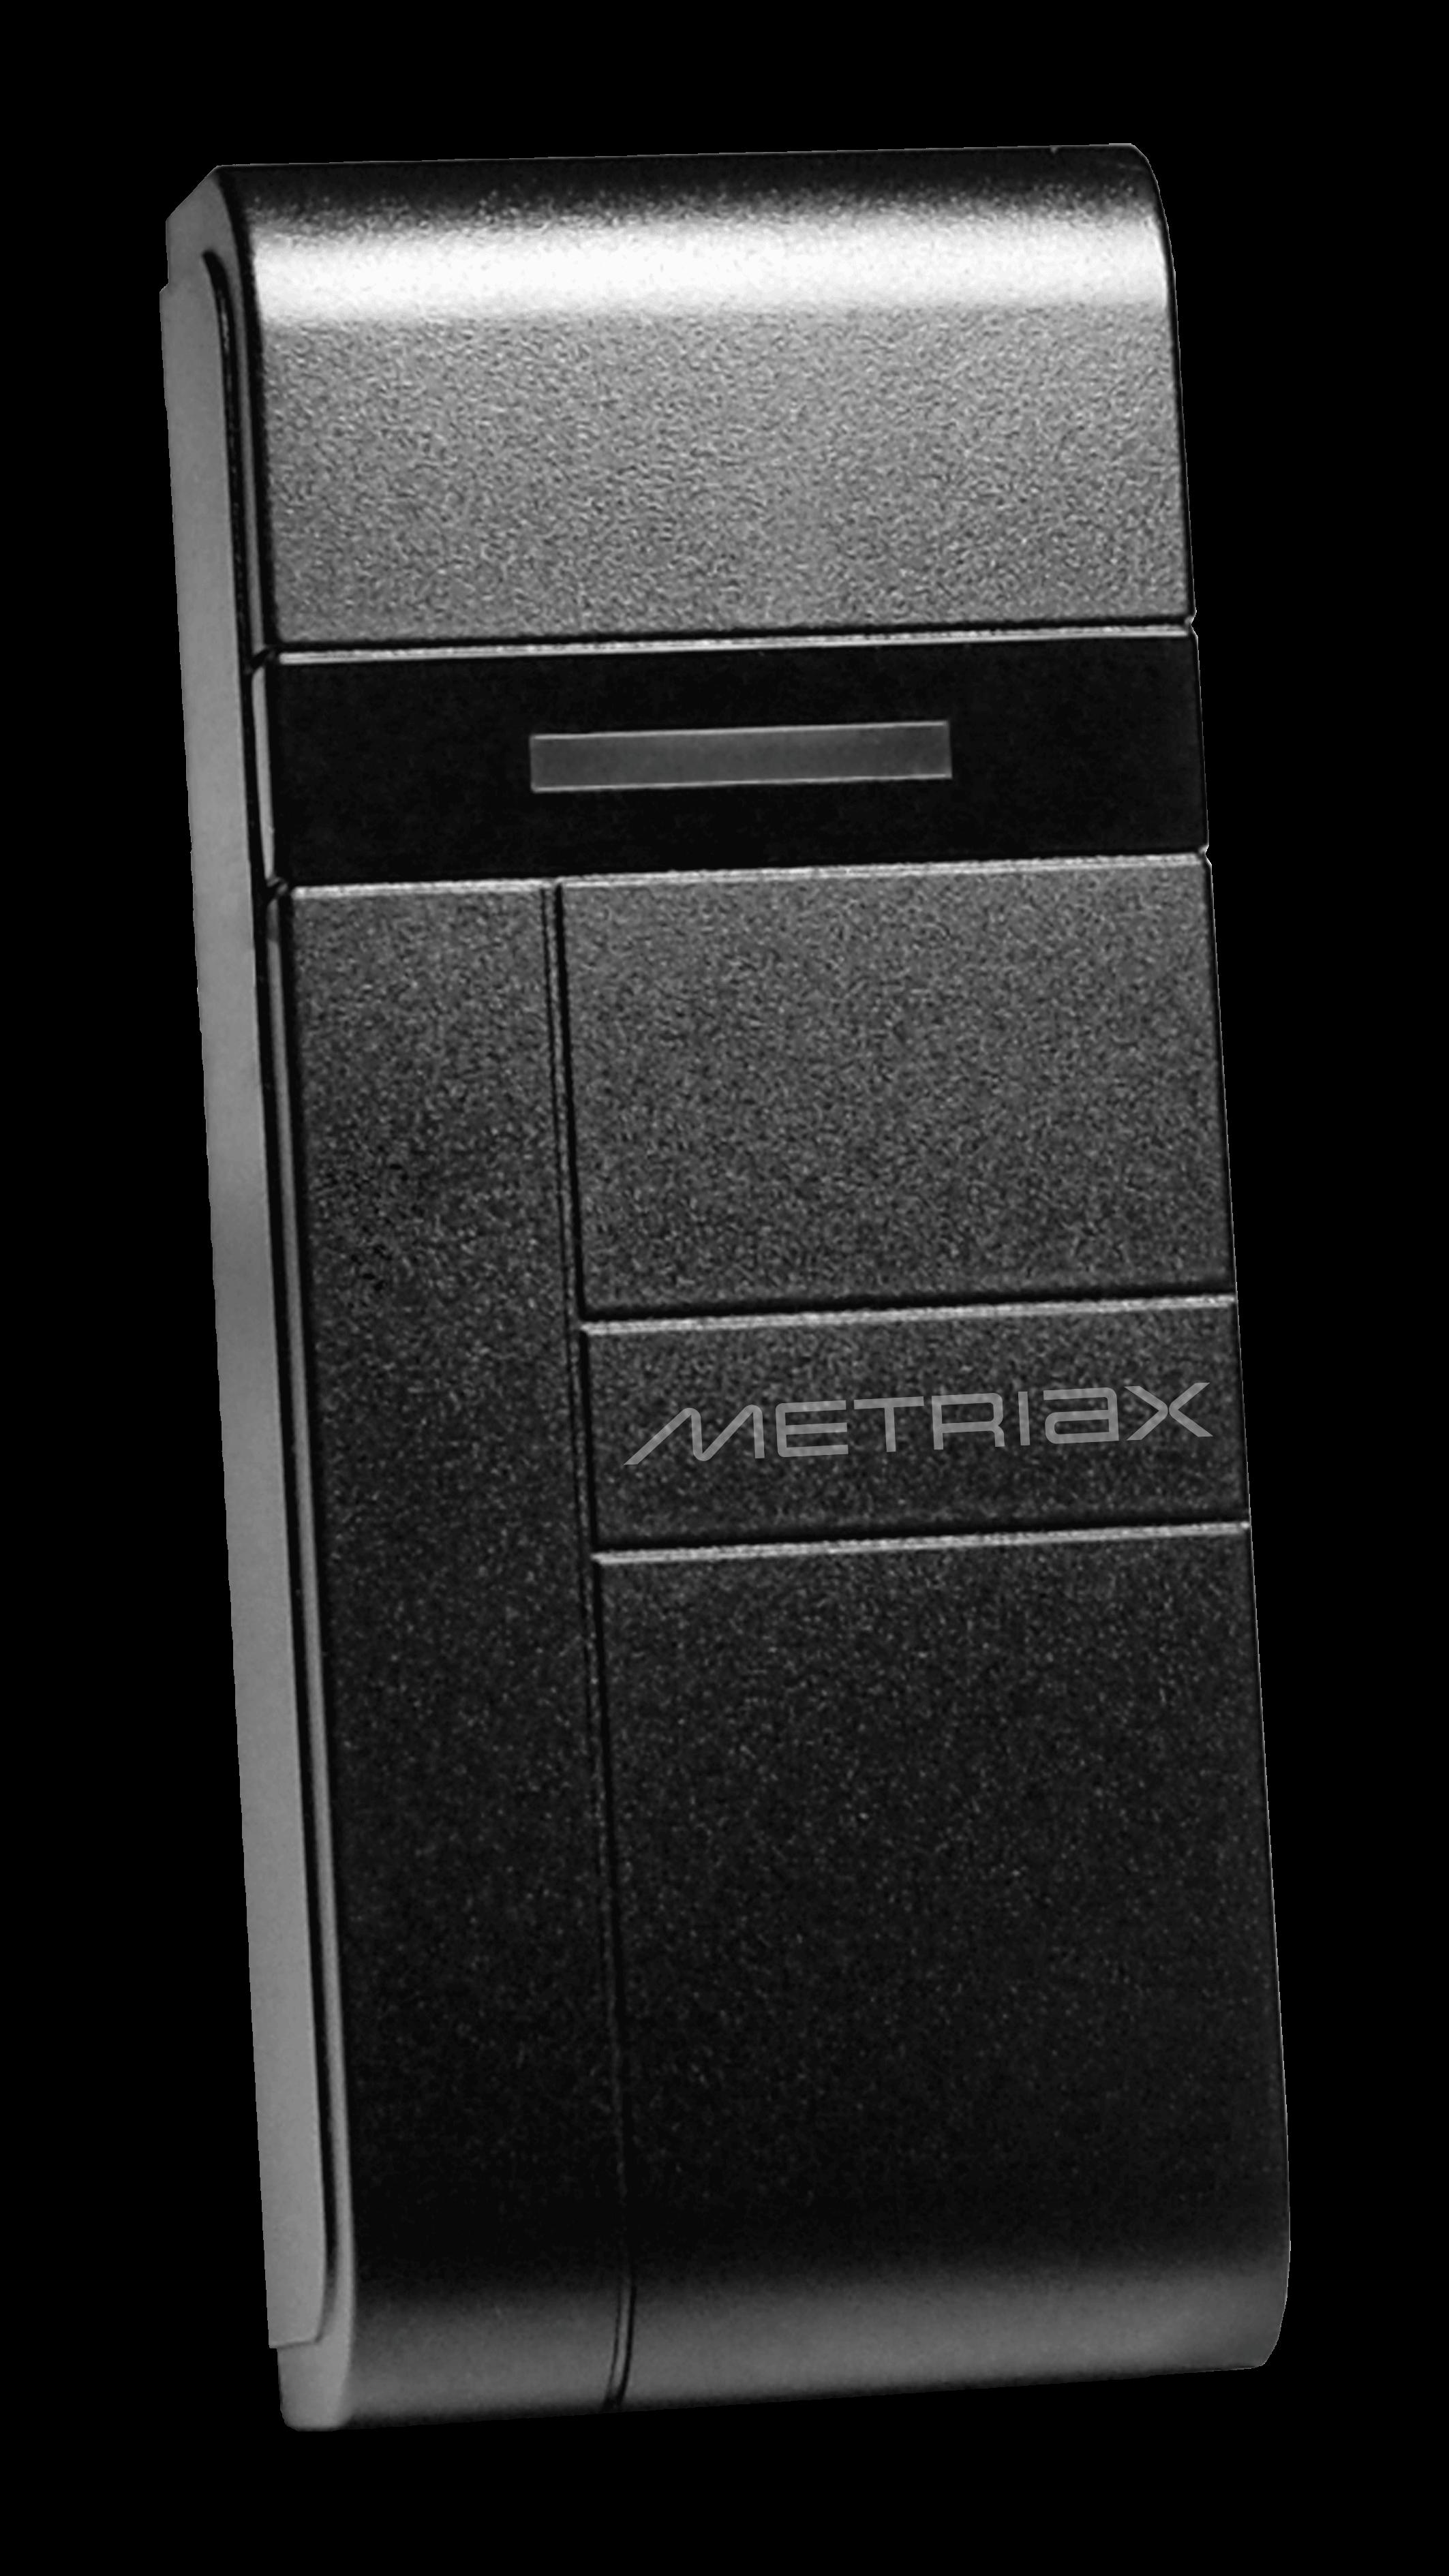 Metriax-MDE 950- RFID RS485 Modbus Reader-Ladecontroller-similar to Quio QDE-950-4